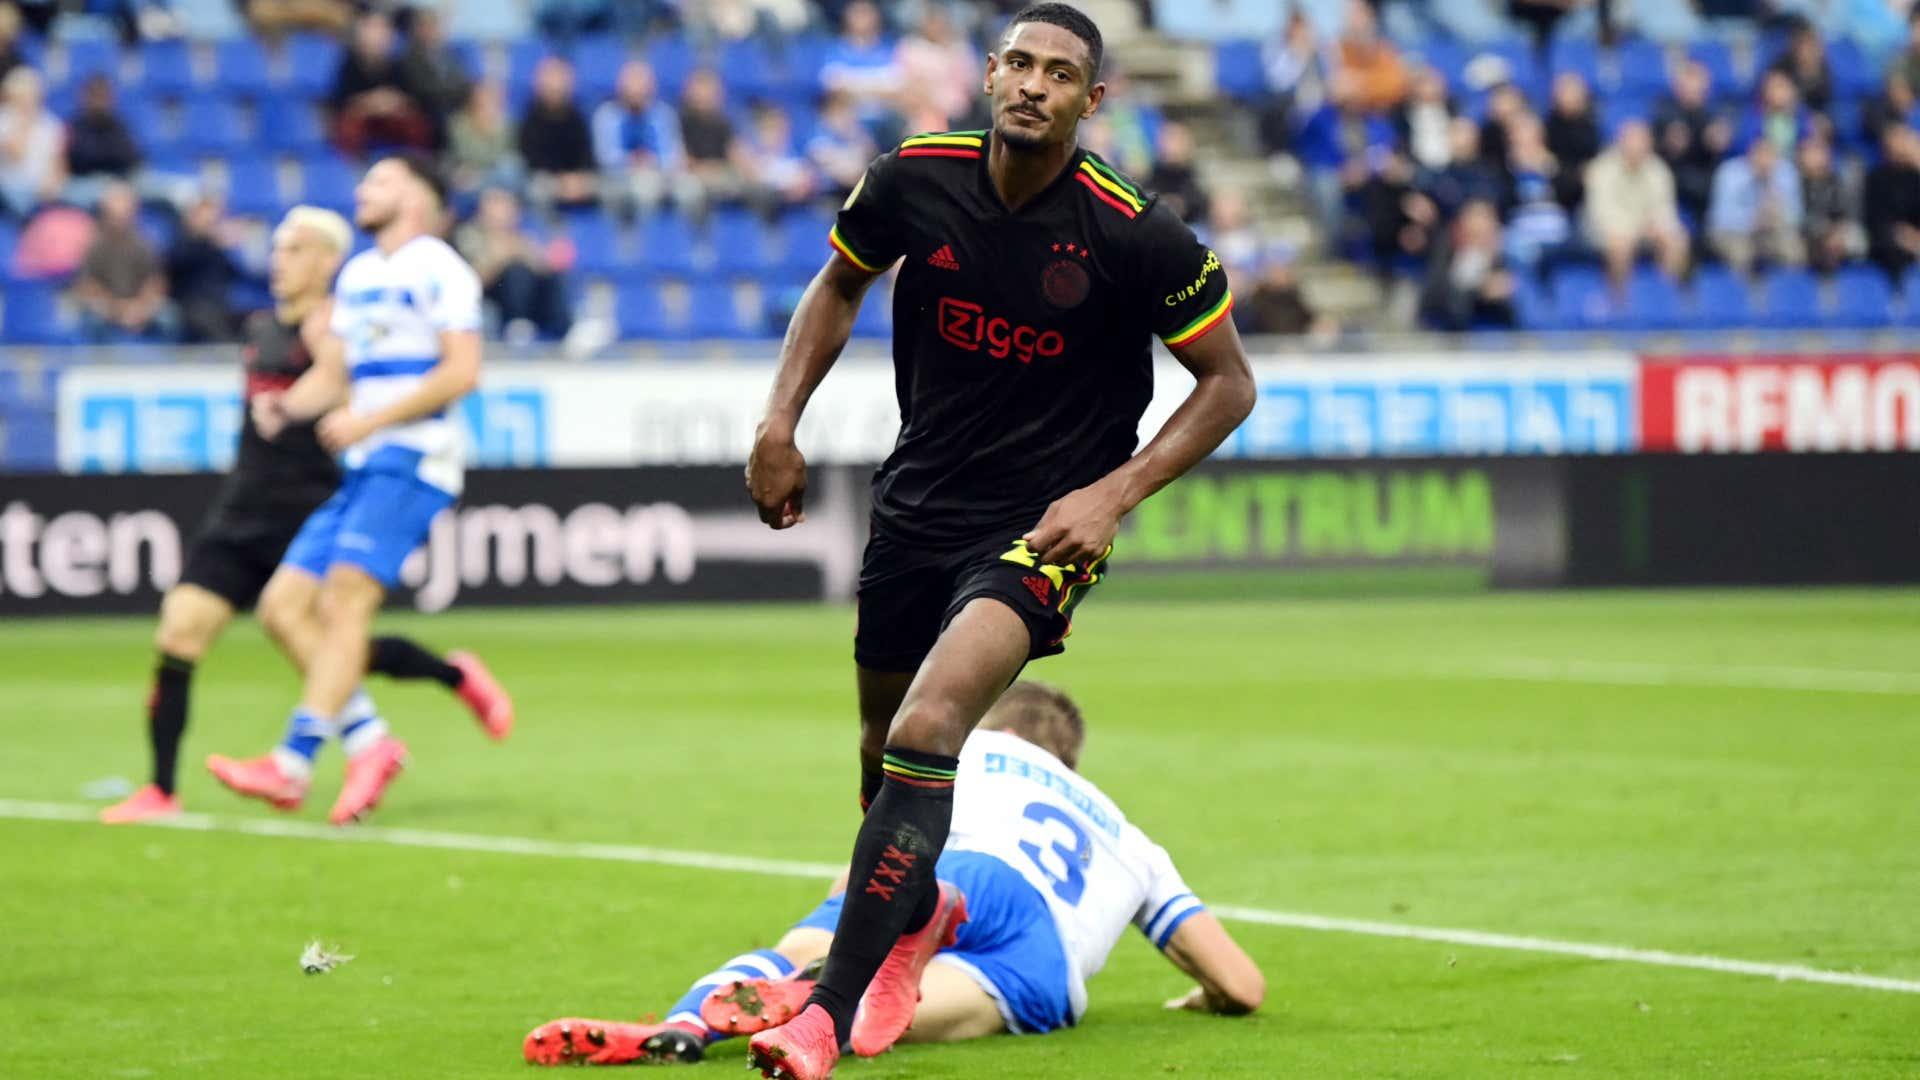 Haller: Cote d'Ivoire forward scores as Kudus returns to Ajax line-up